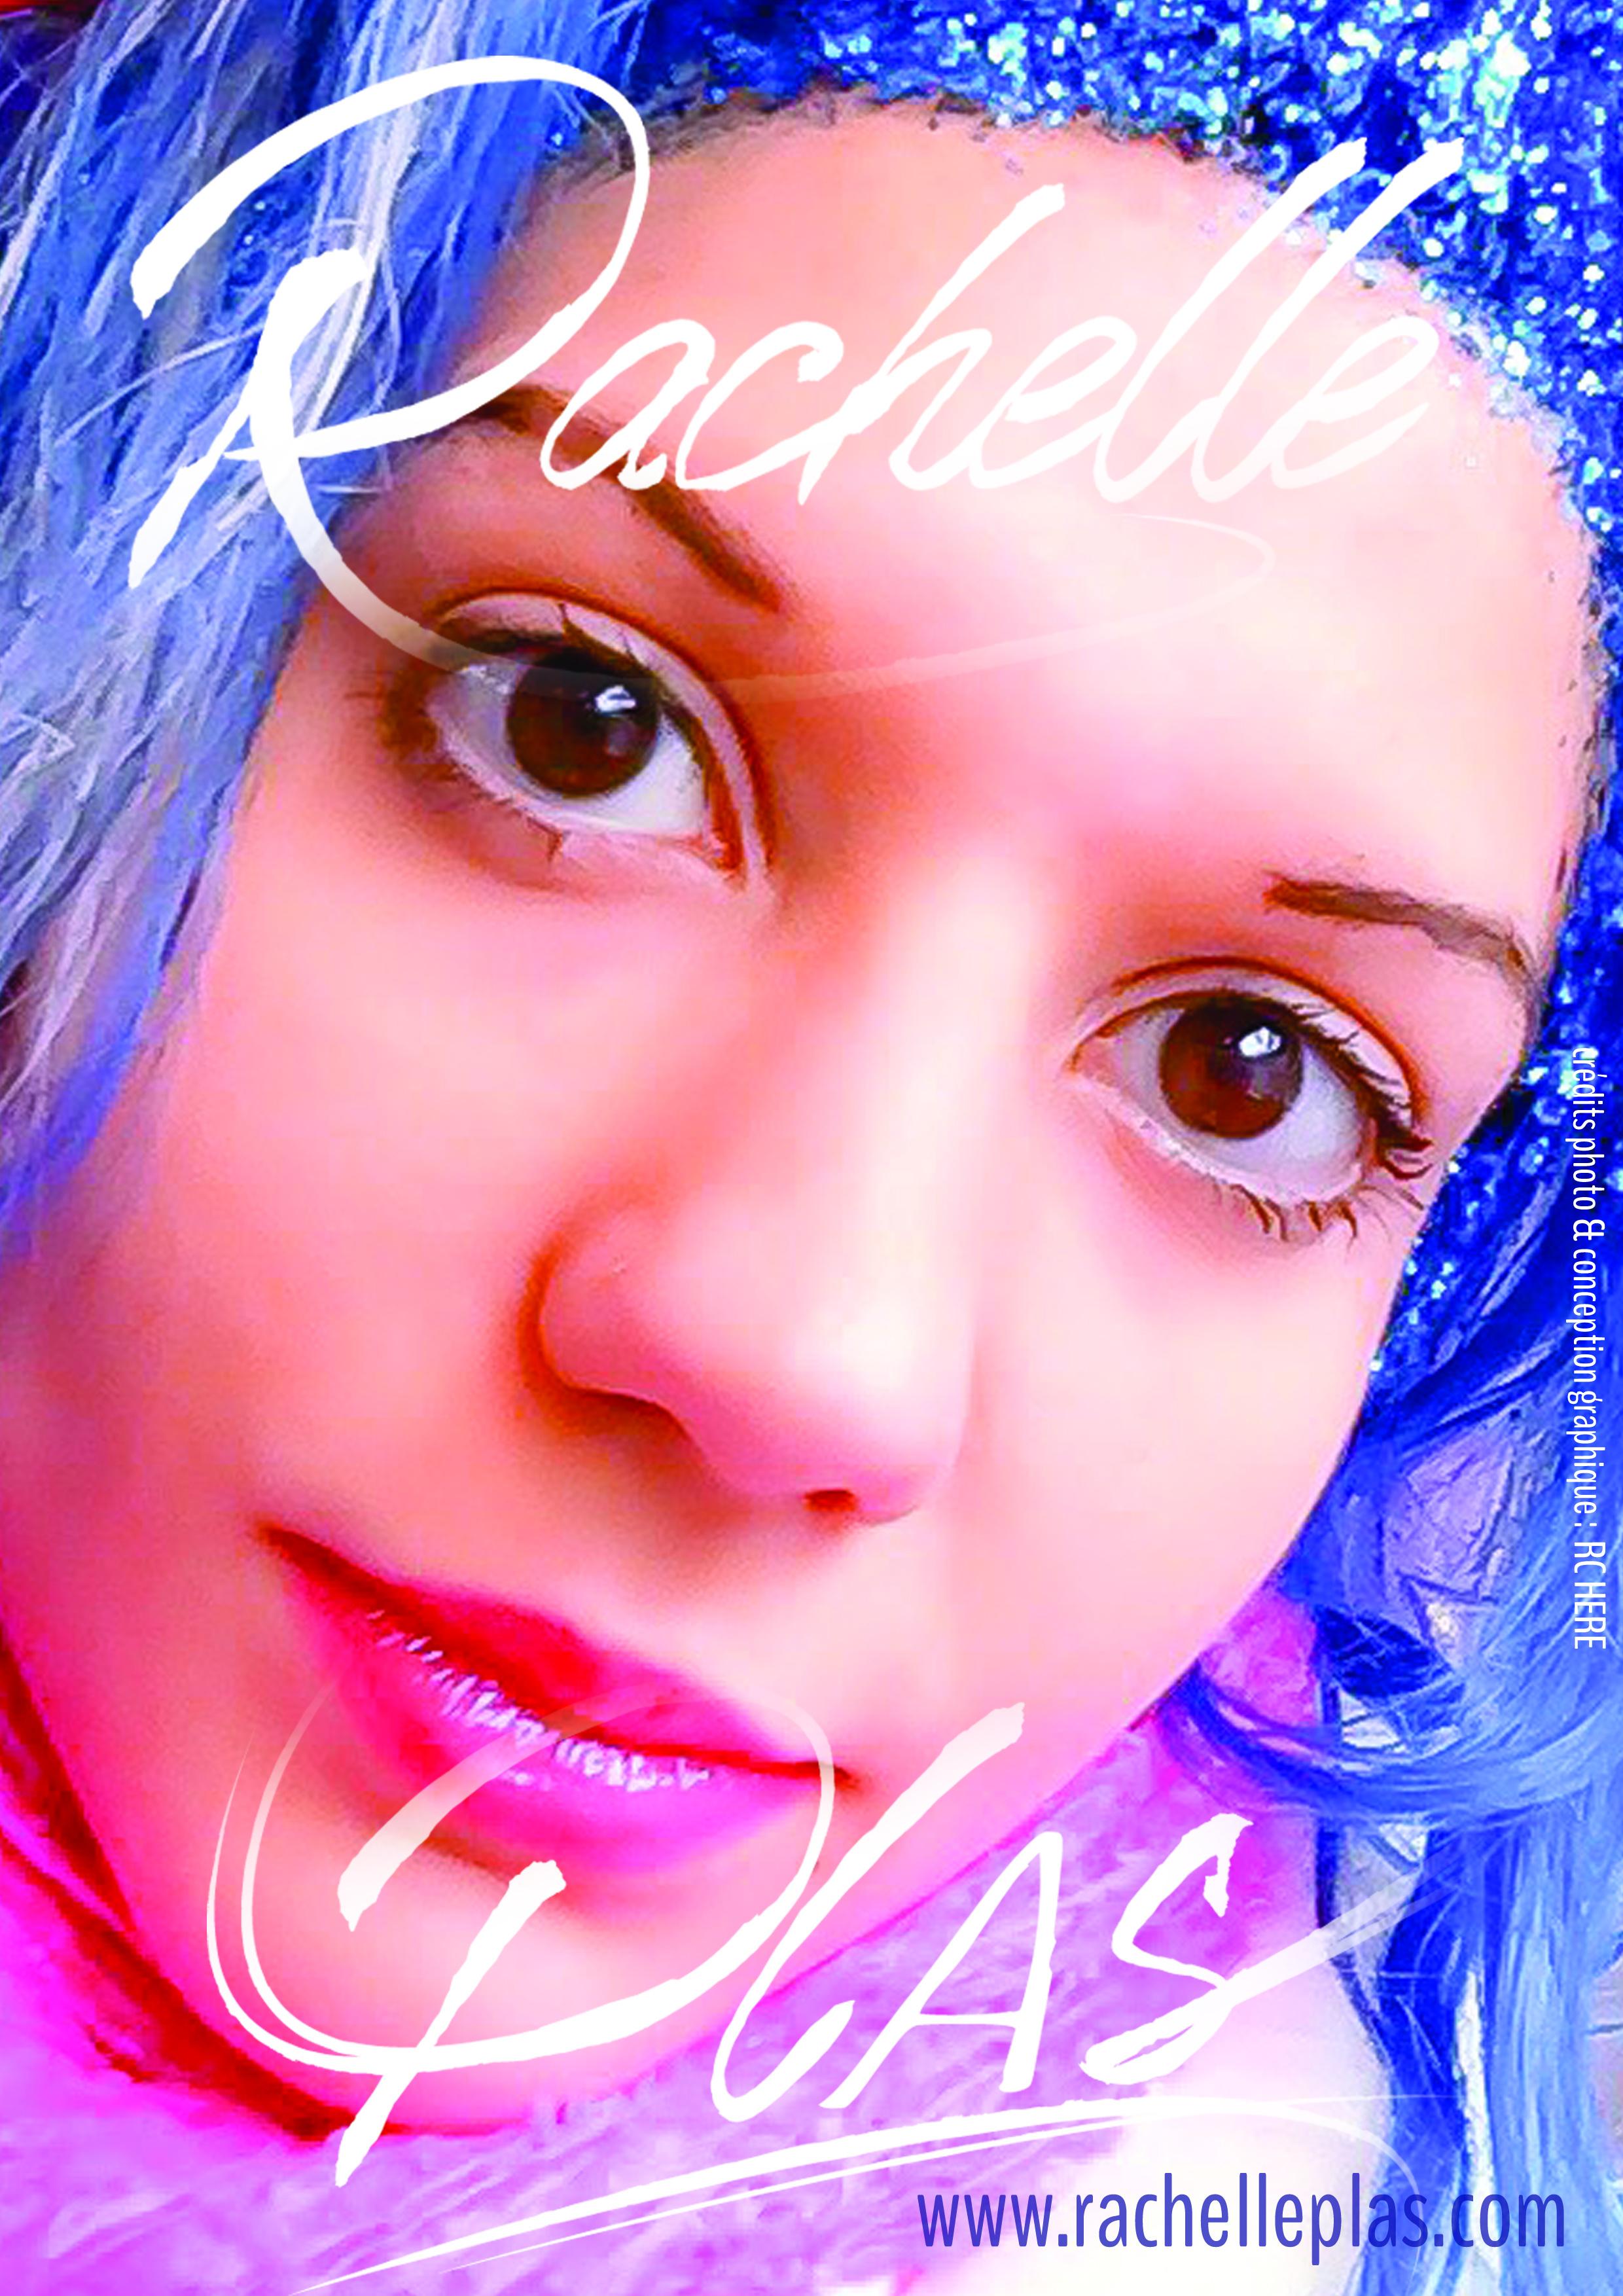 chanteuse Rachelle Plas harmonica